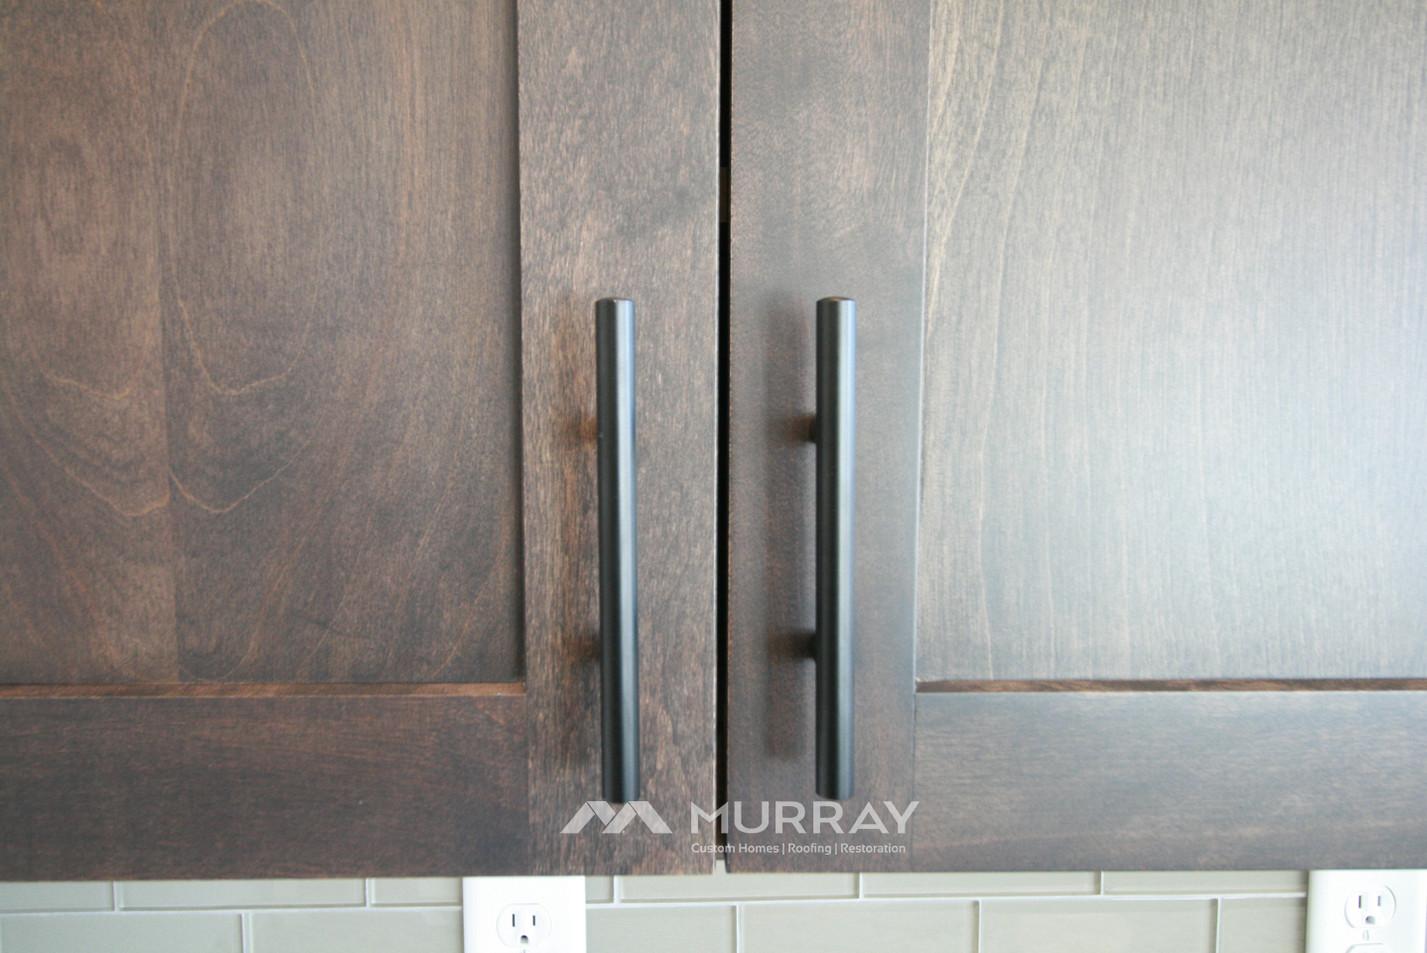 Murray Custom Home Builders Gallery SW Village Heights 6525 Kitchen Cabinet Fixture